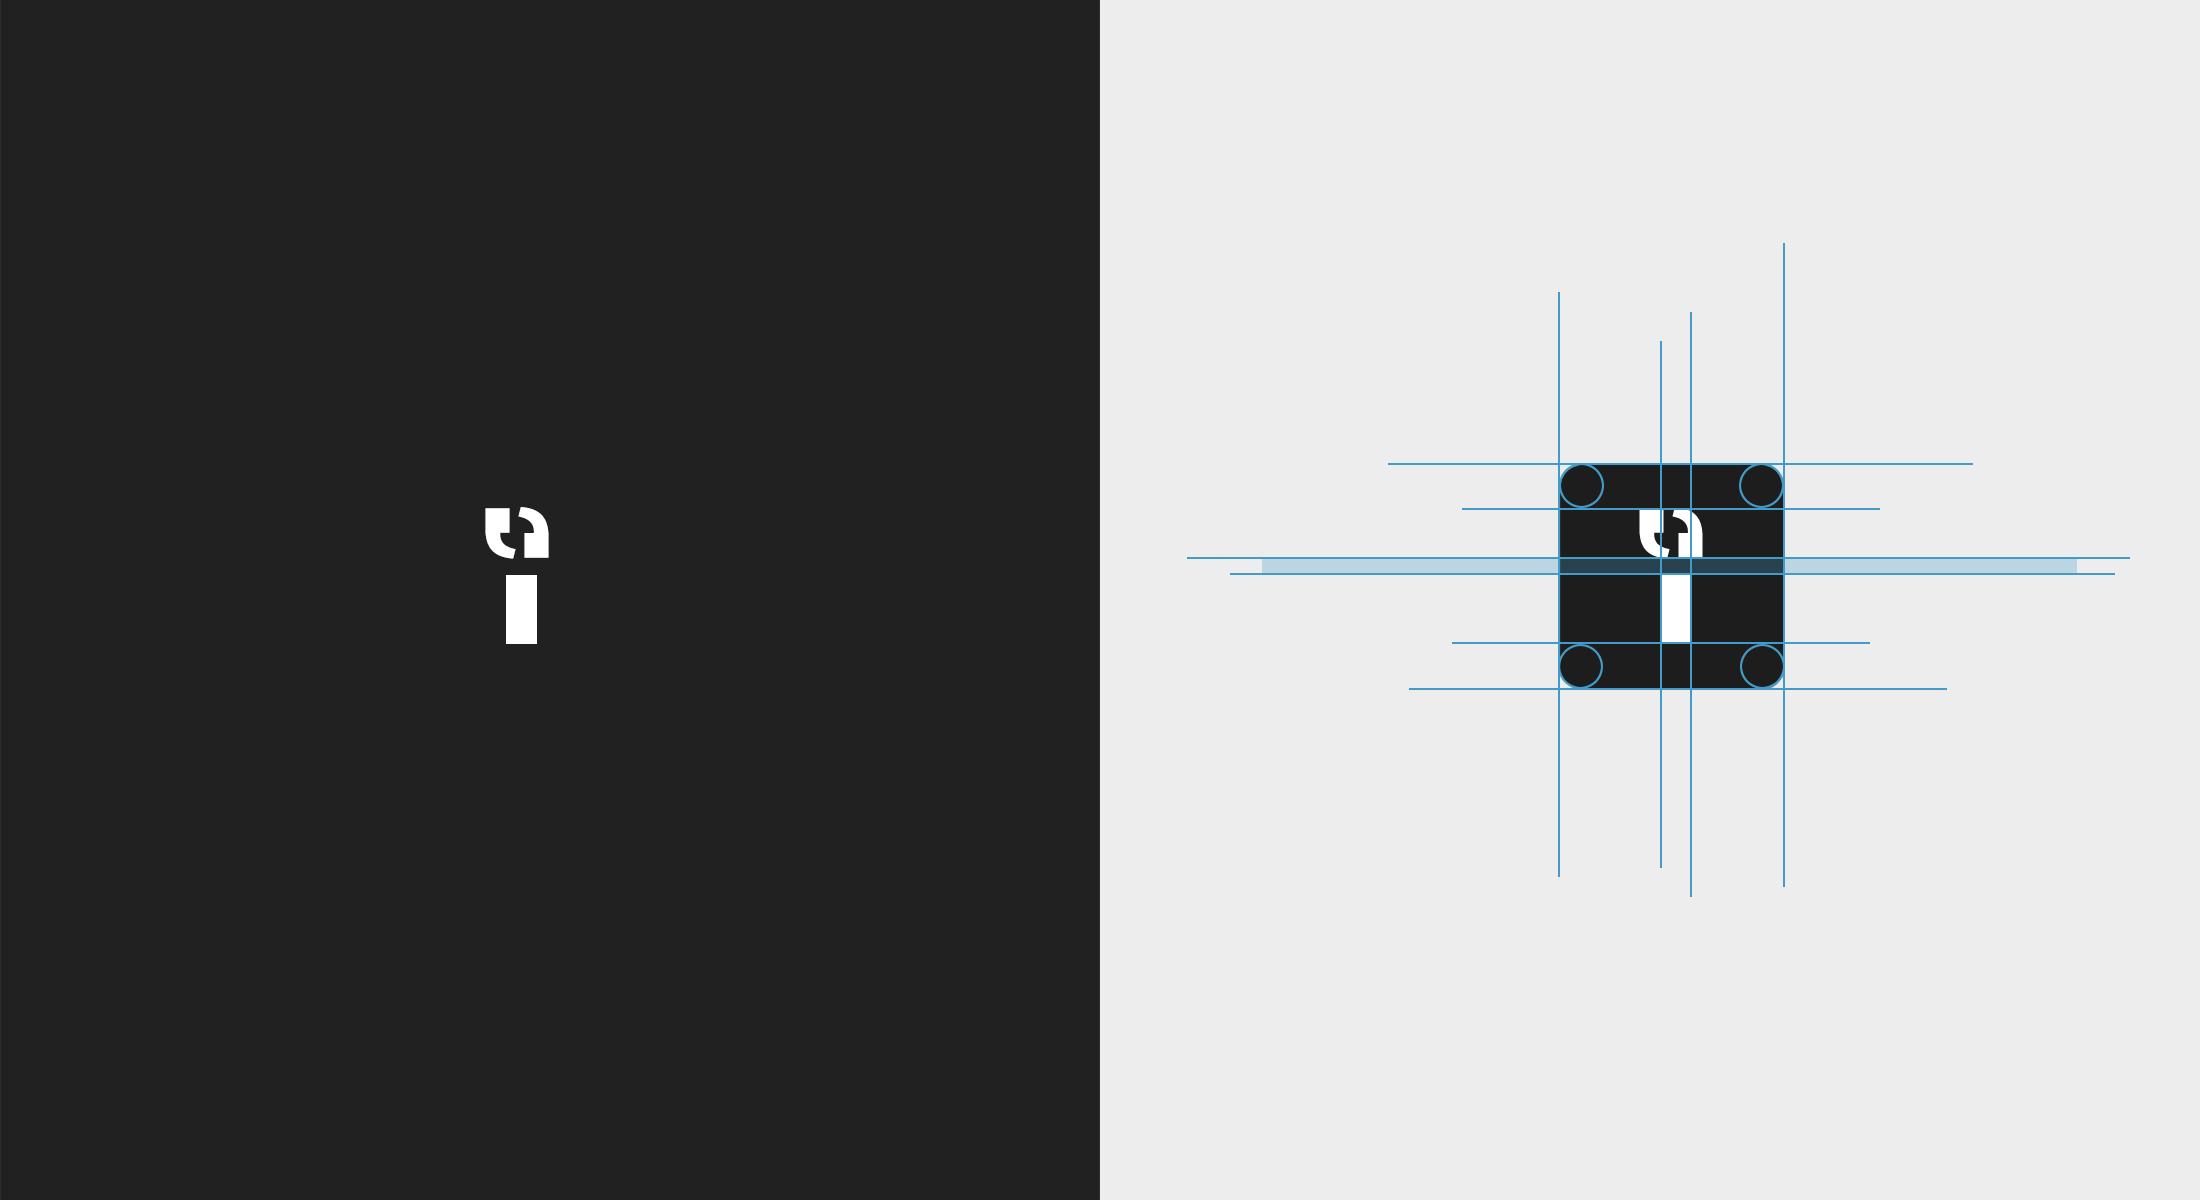 The app icon grid